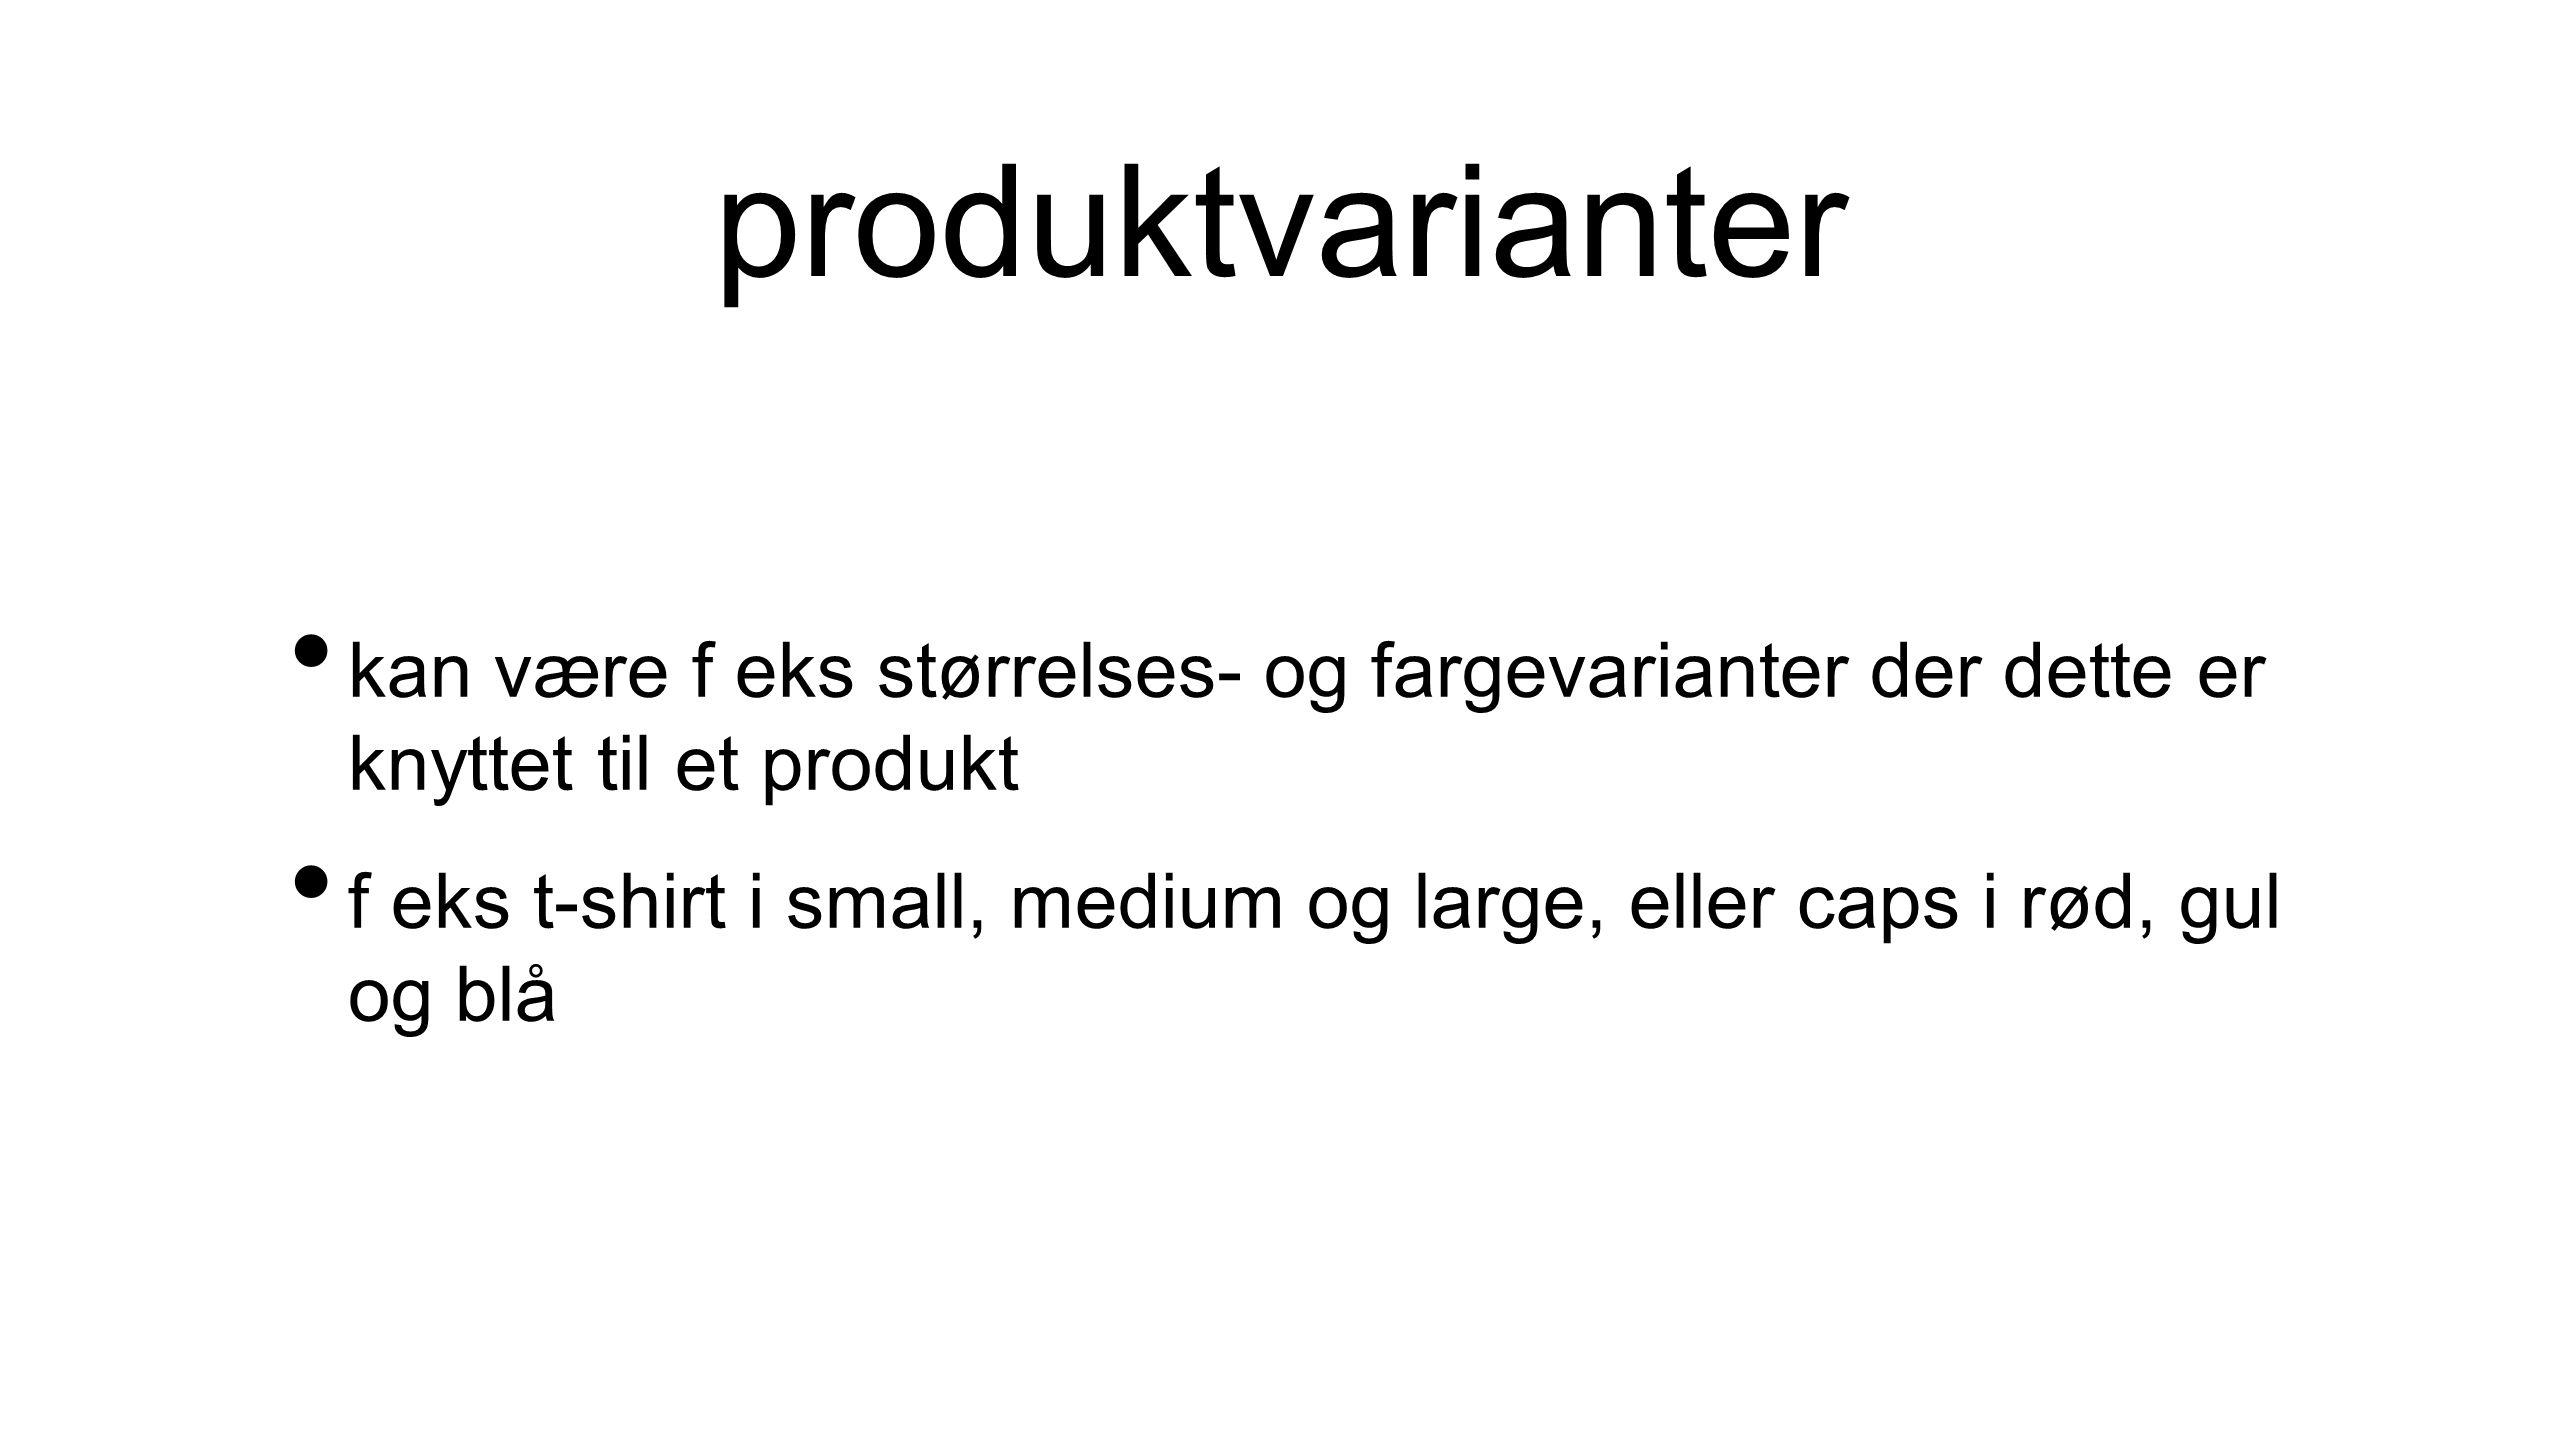 produktvarianter • kan være f eks størrelses- og fargevarianter der dette er knyttet til et produkt • f eks t-shirt i small, medium og large, eller ca